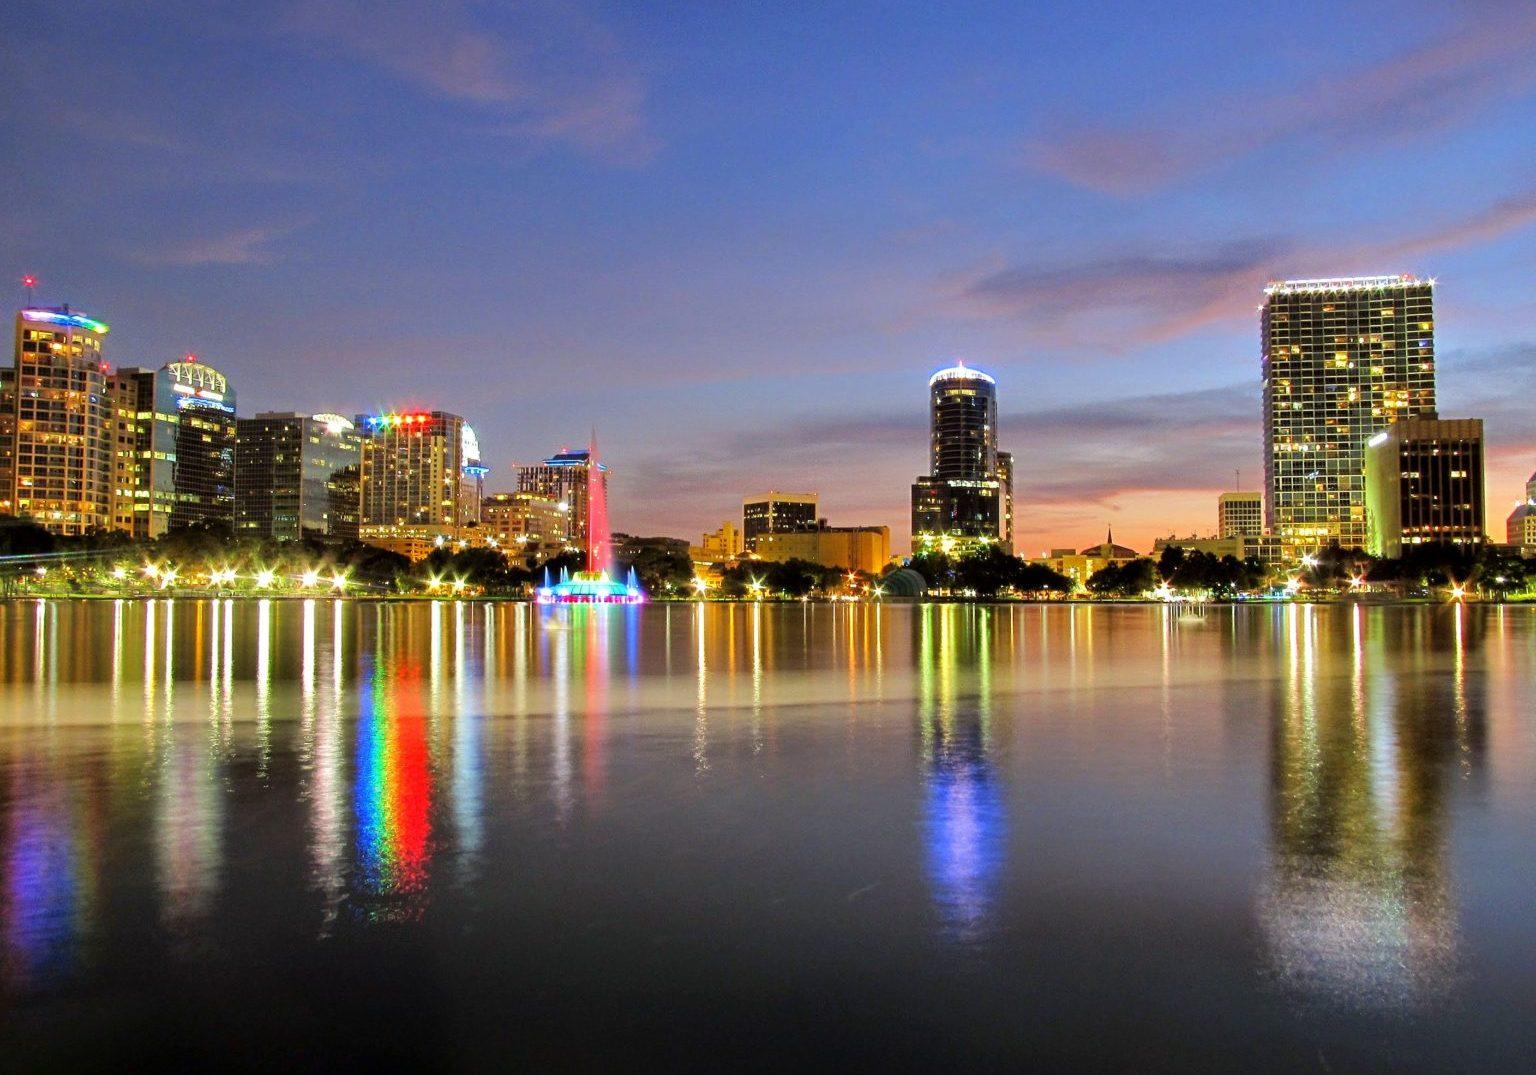 Lake_Eola_Park_in_Orlando_02